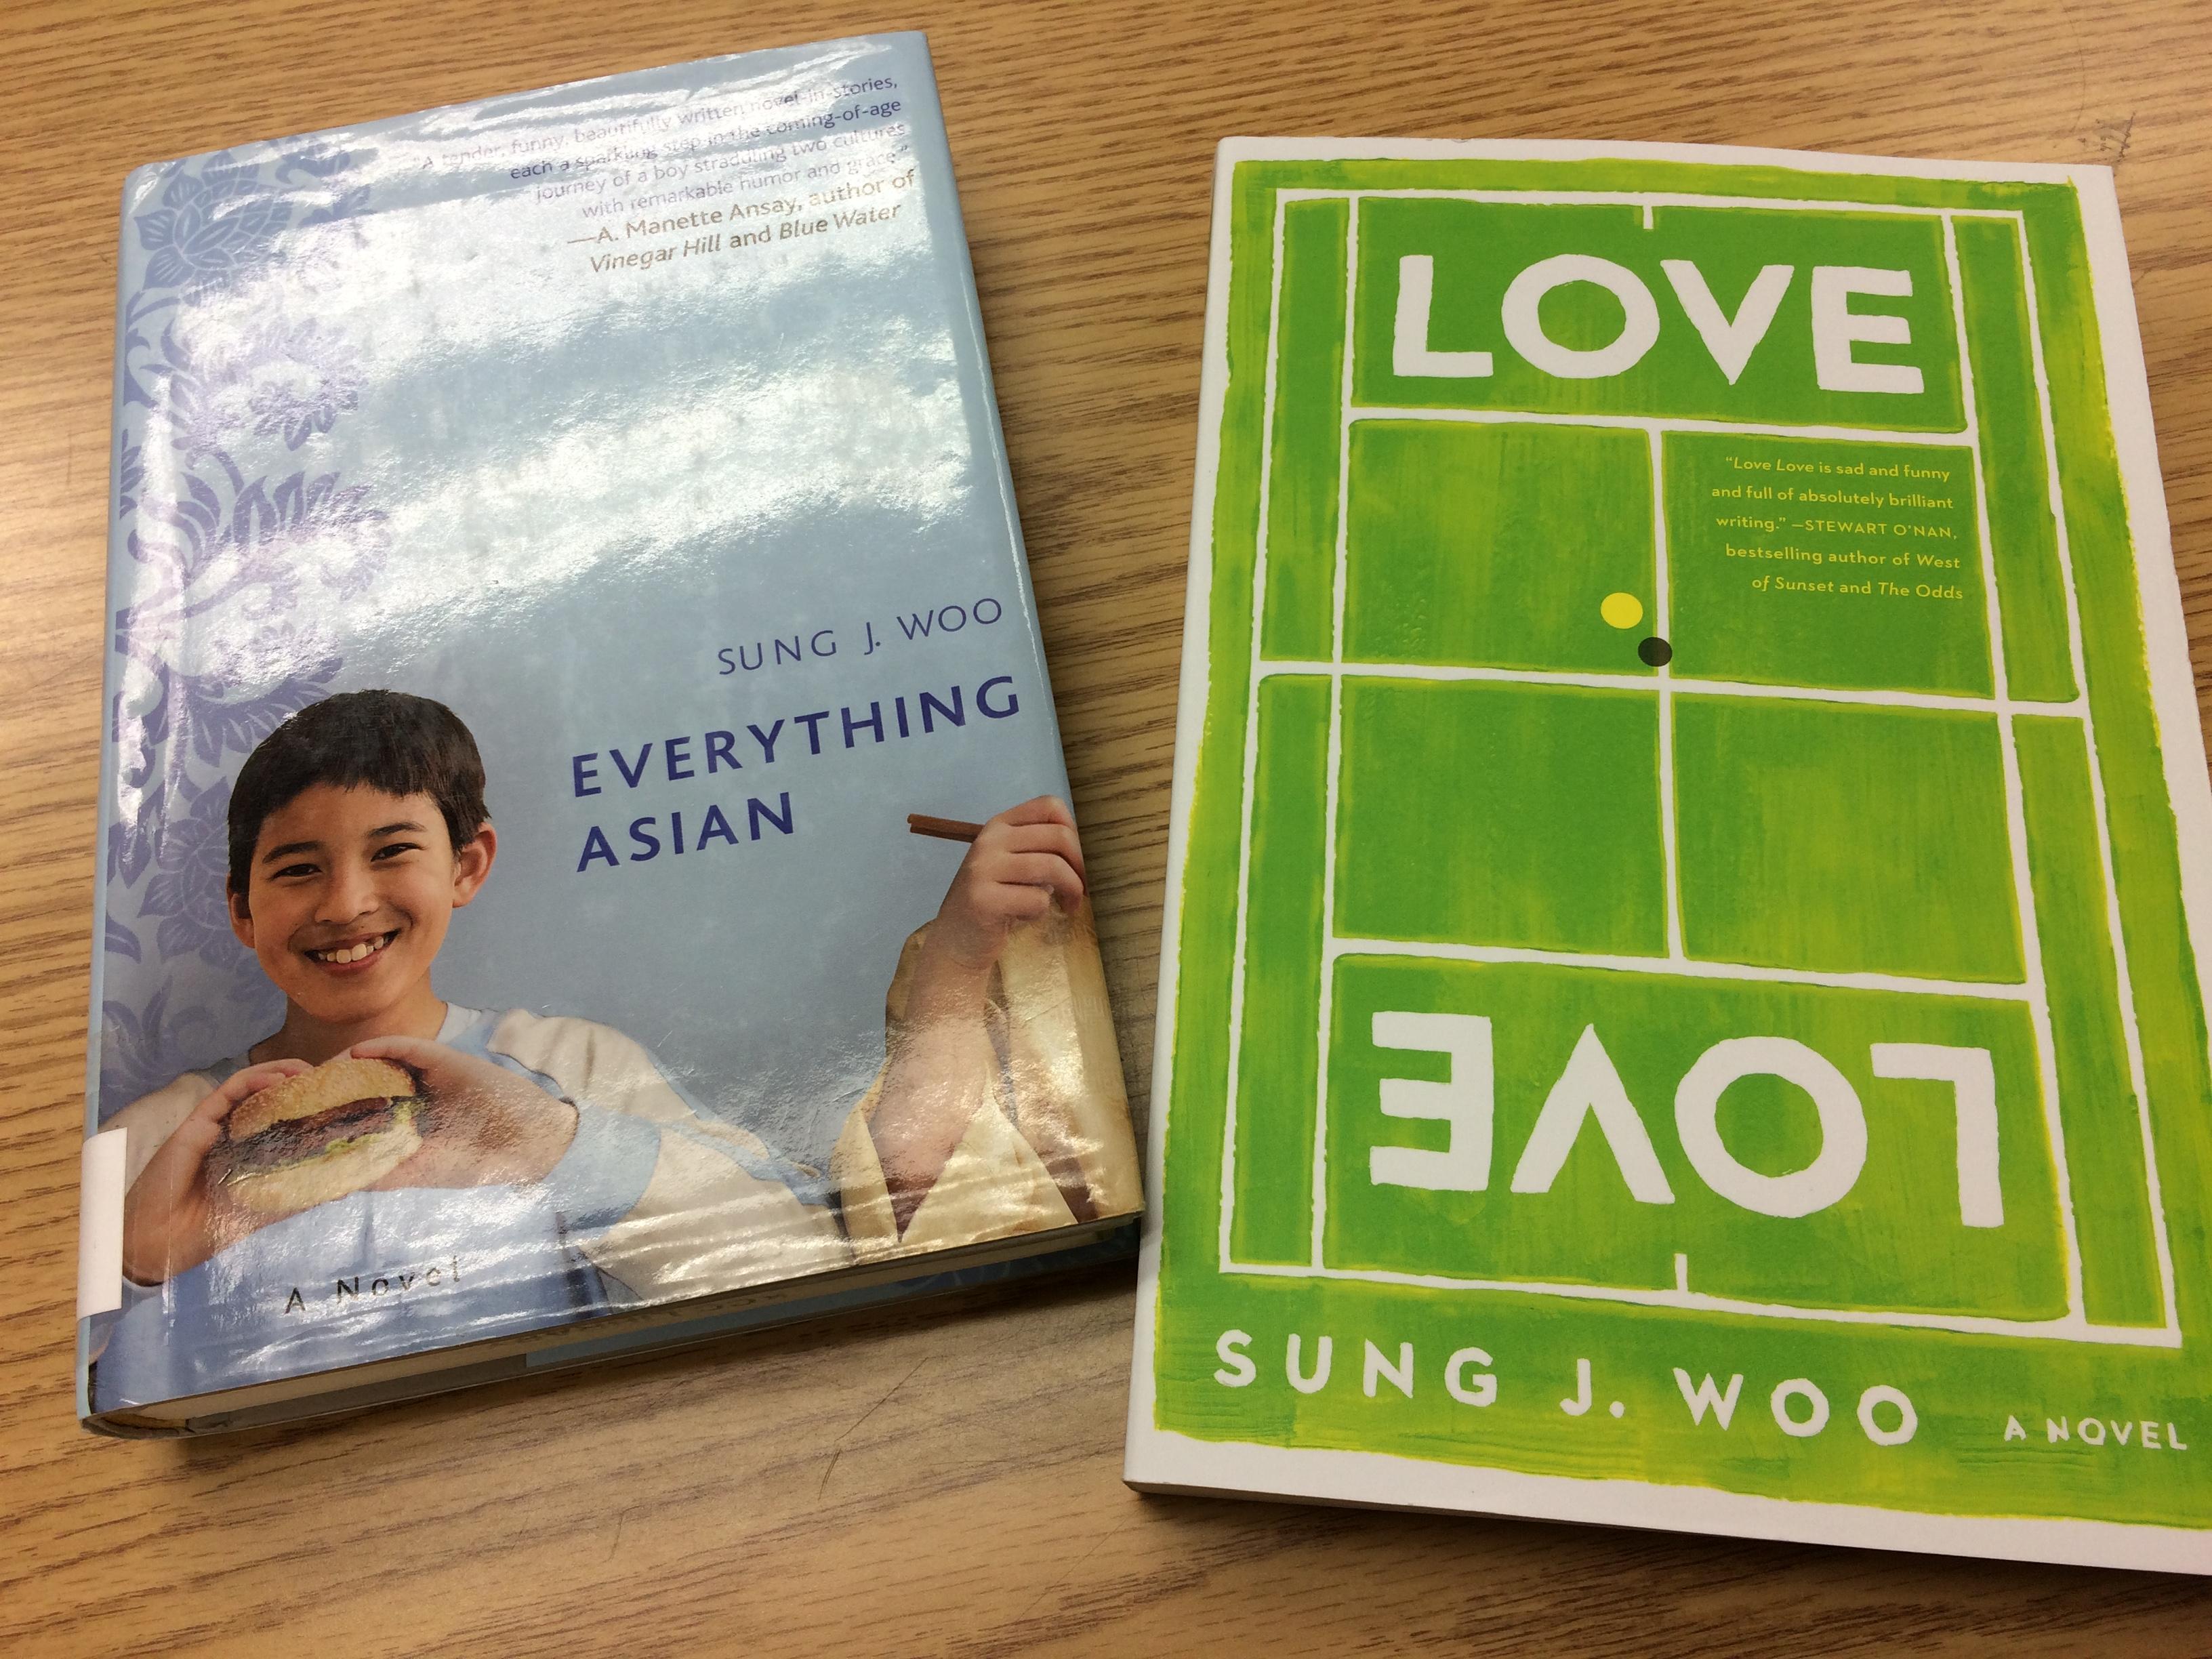 SungJWooMeeting_BookCellar (2).JPG